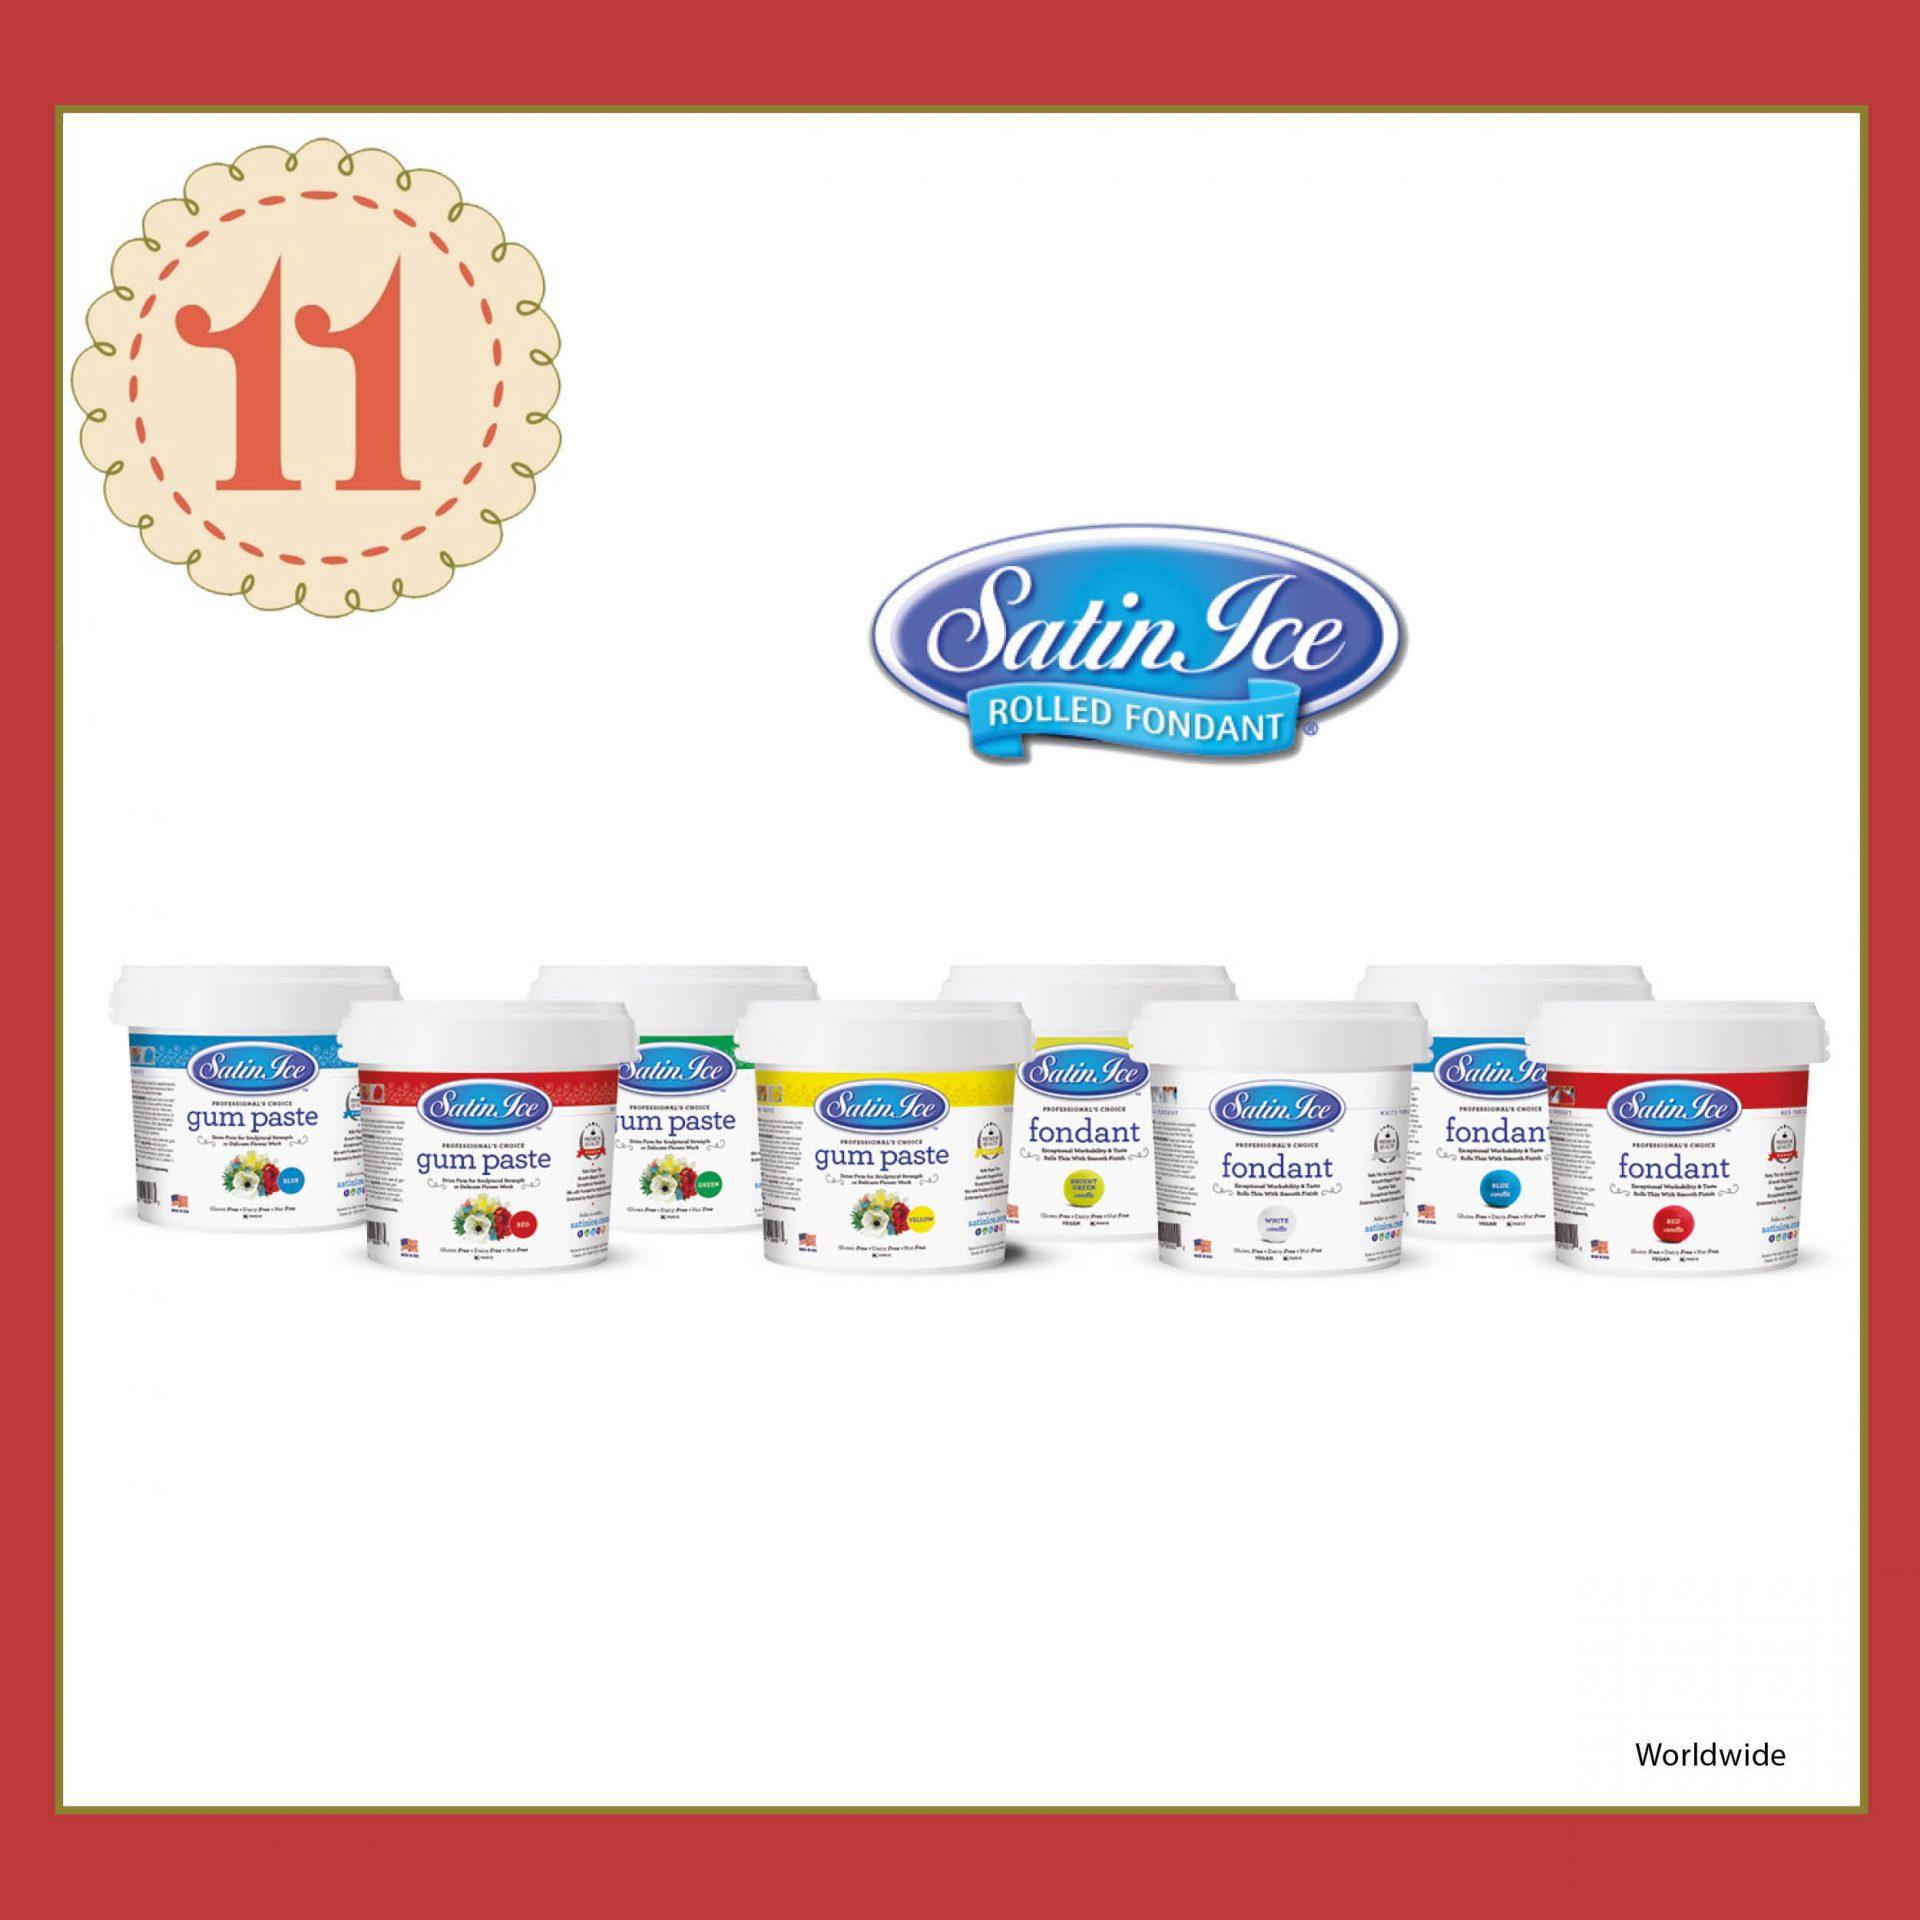 11th-december-satin-ice